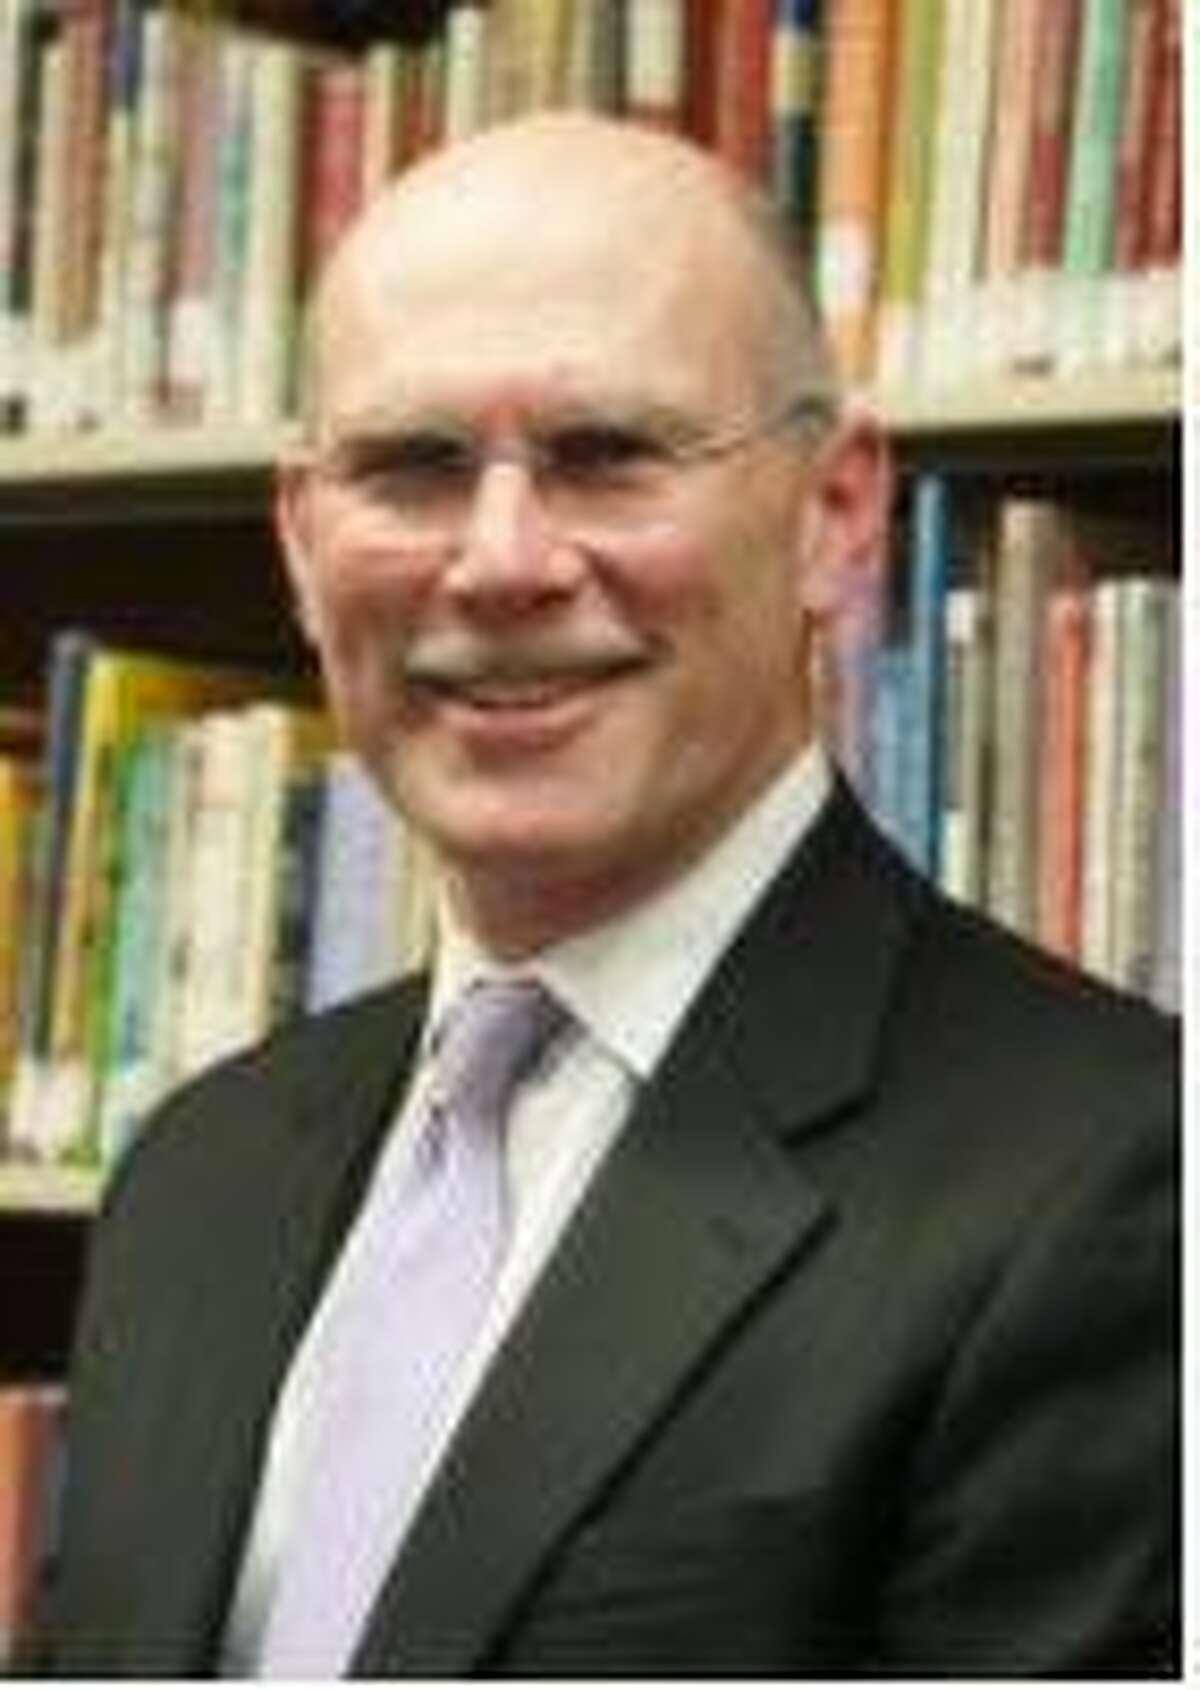 Branford Board of Education Chairman John Prins